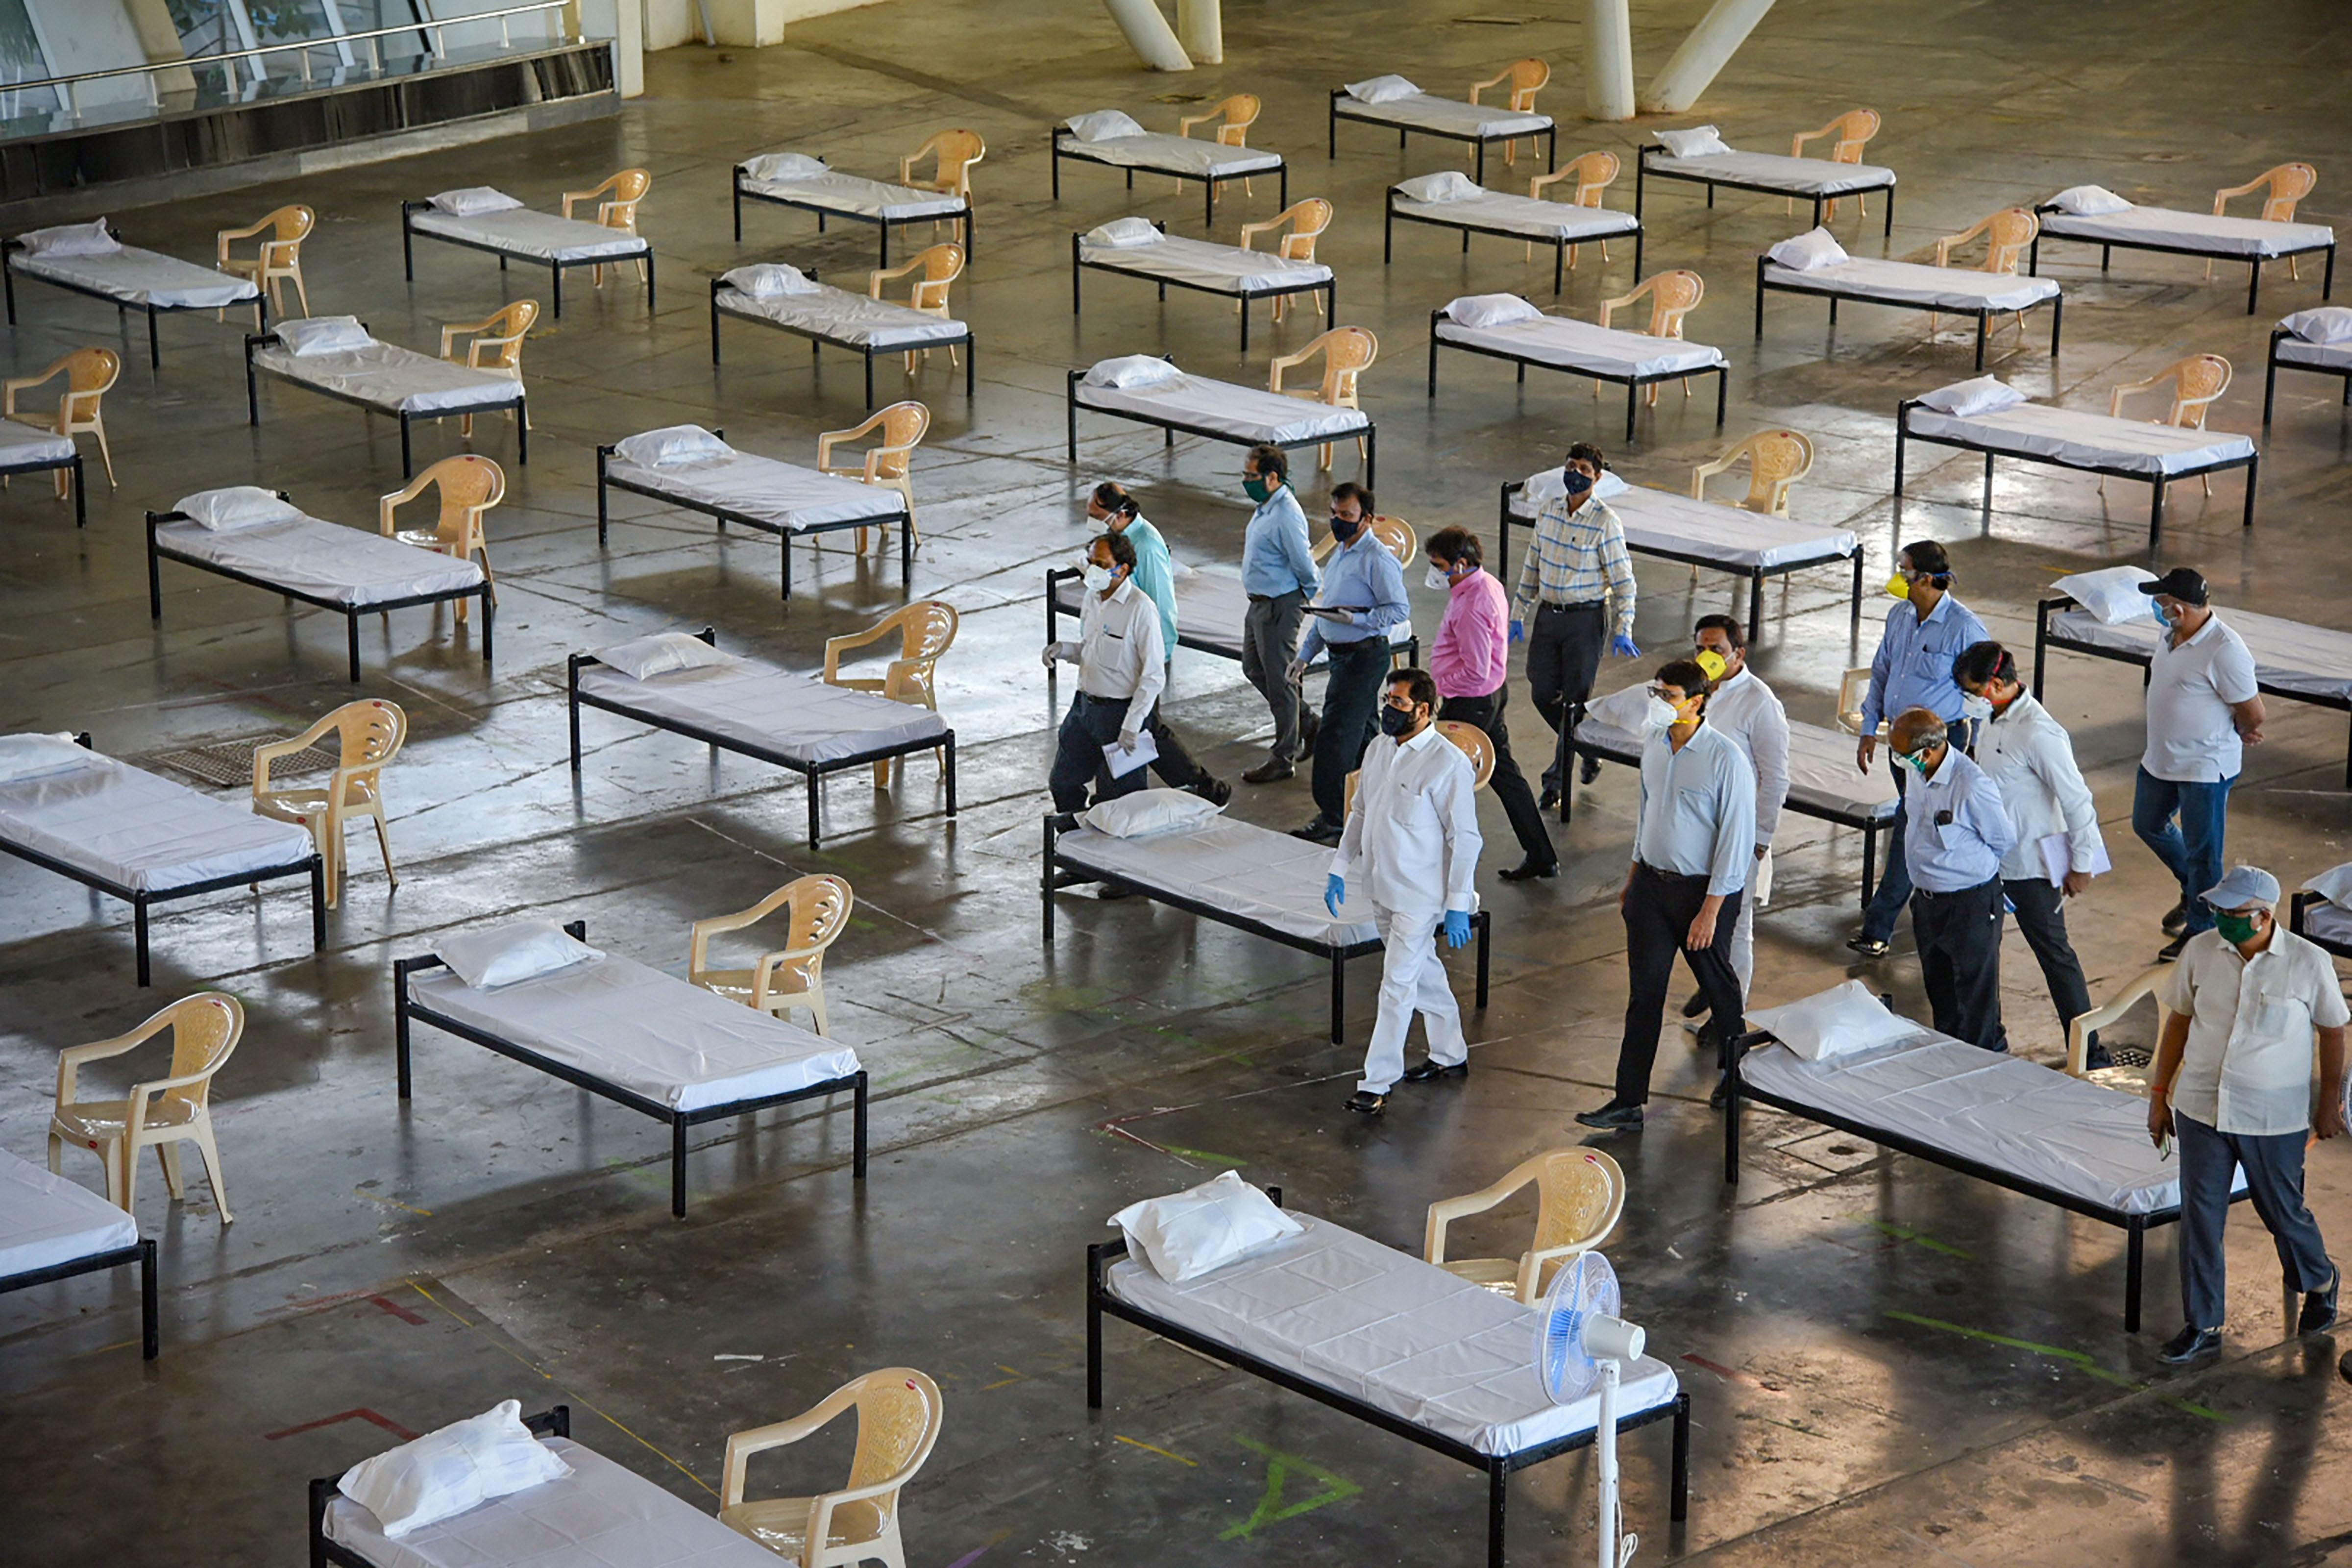 Thane guardian minister Eknath Shinde inspects a Covid-19 quarantine facility at CIDCO Exhibition Center in Navi Mumbai on Thursday.